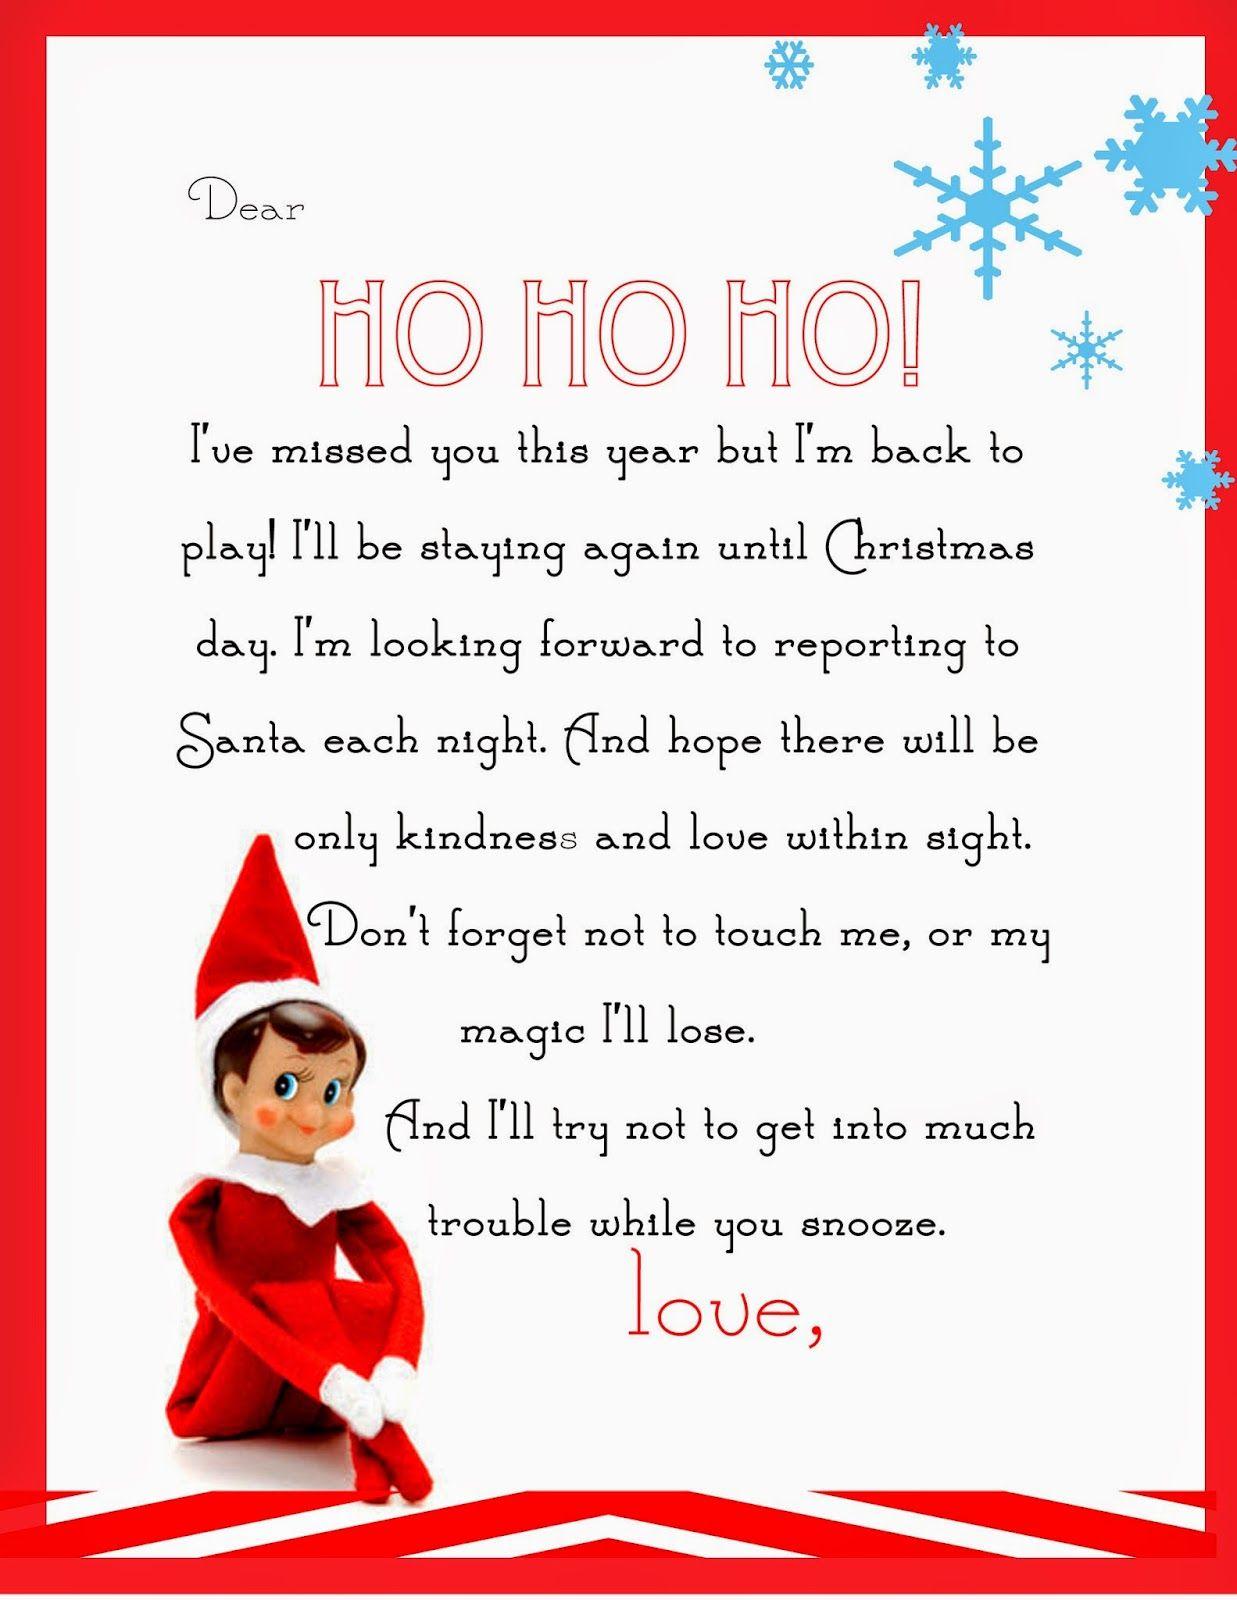 Elf On The Shelf Letter {Free Printable}   Para Las Muñecas - Elf On The Shelf Goodbye Letter Free Printable